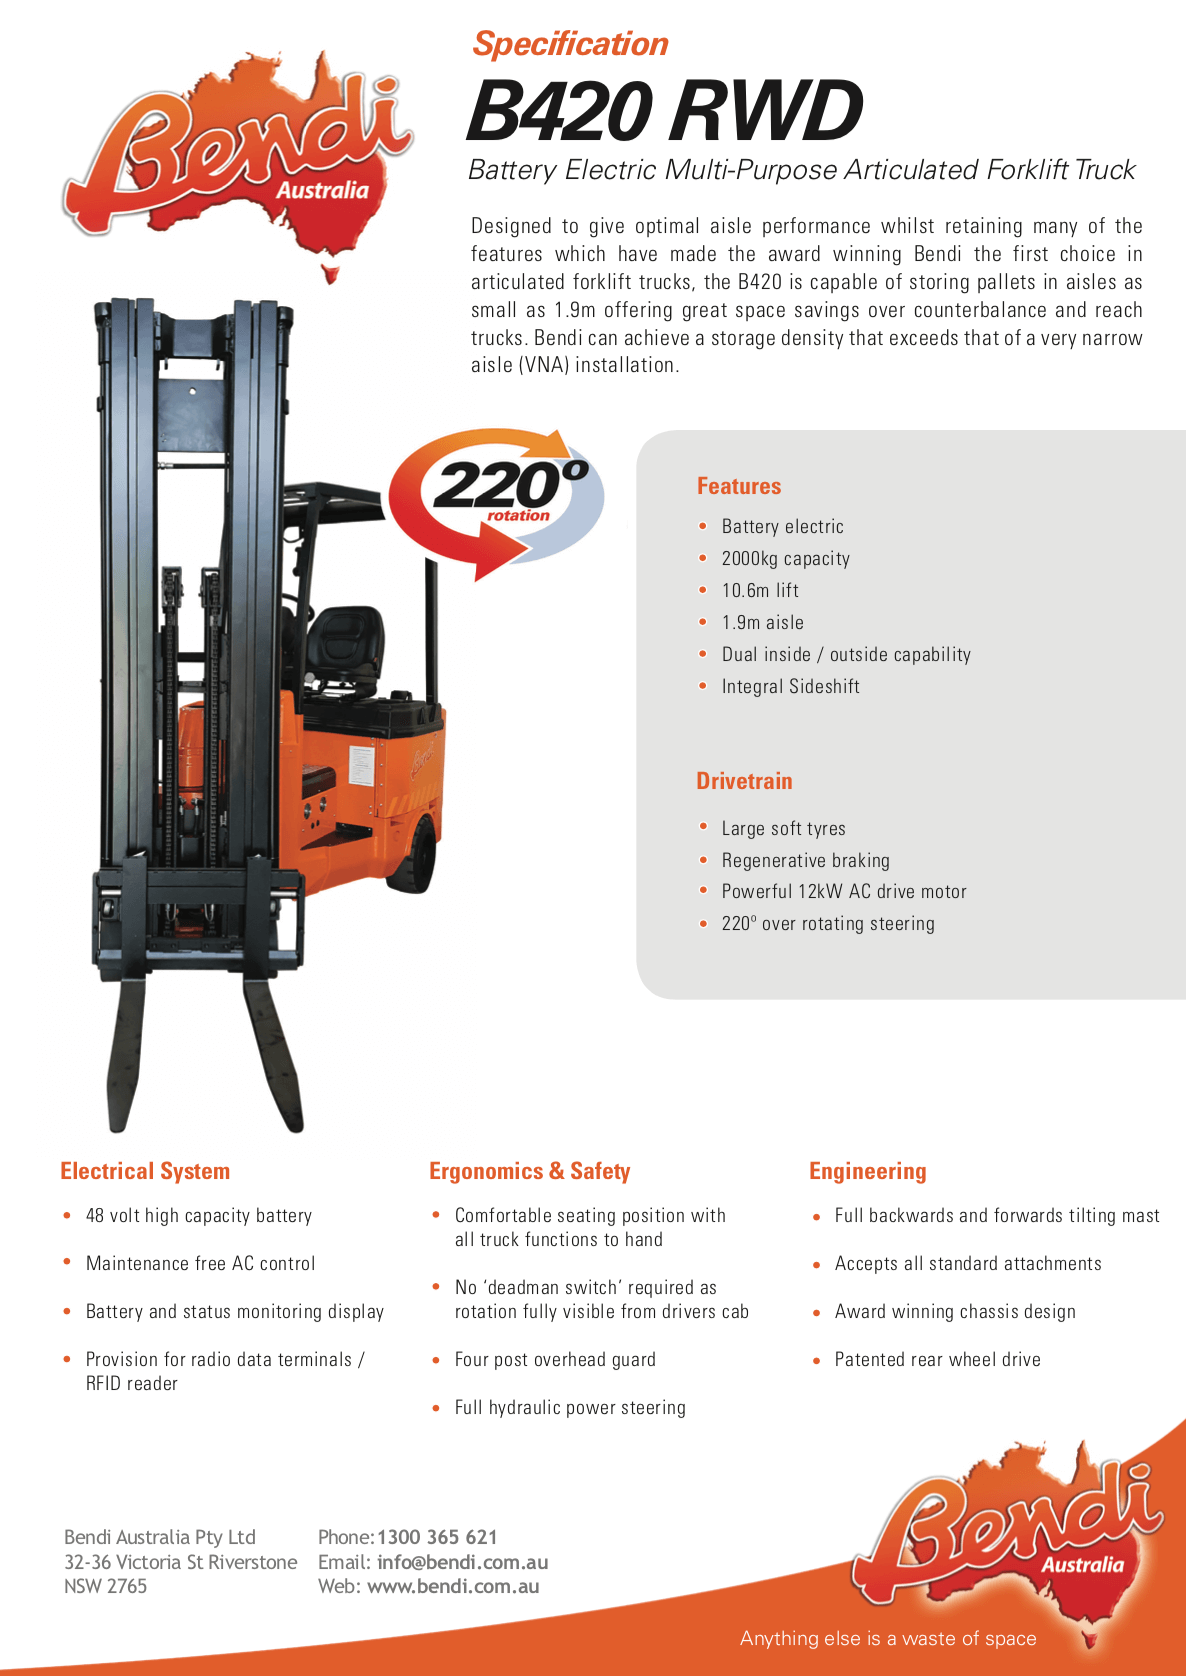 B420 RWD Forklift